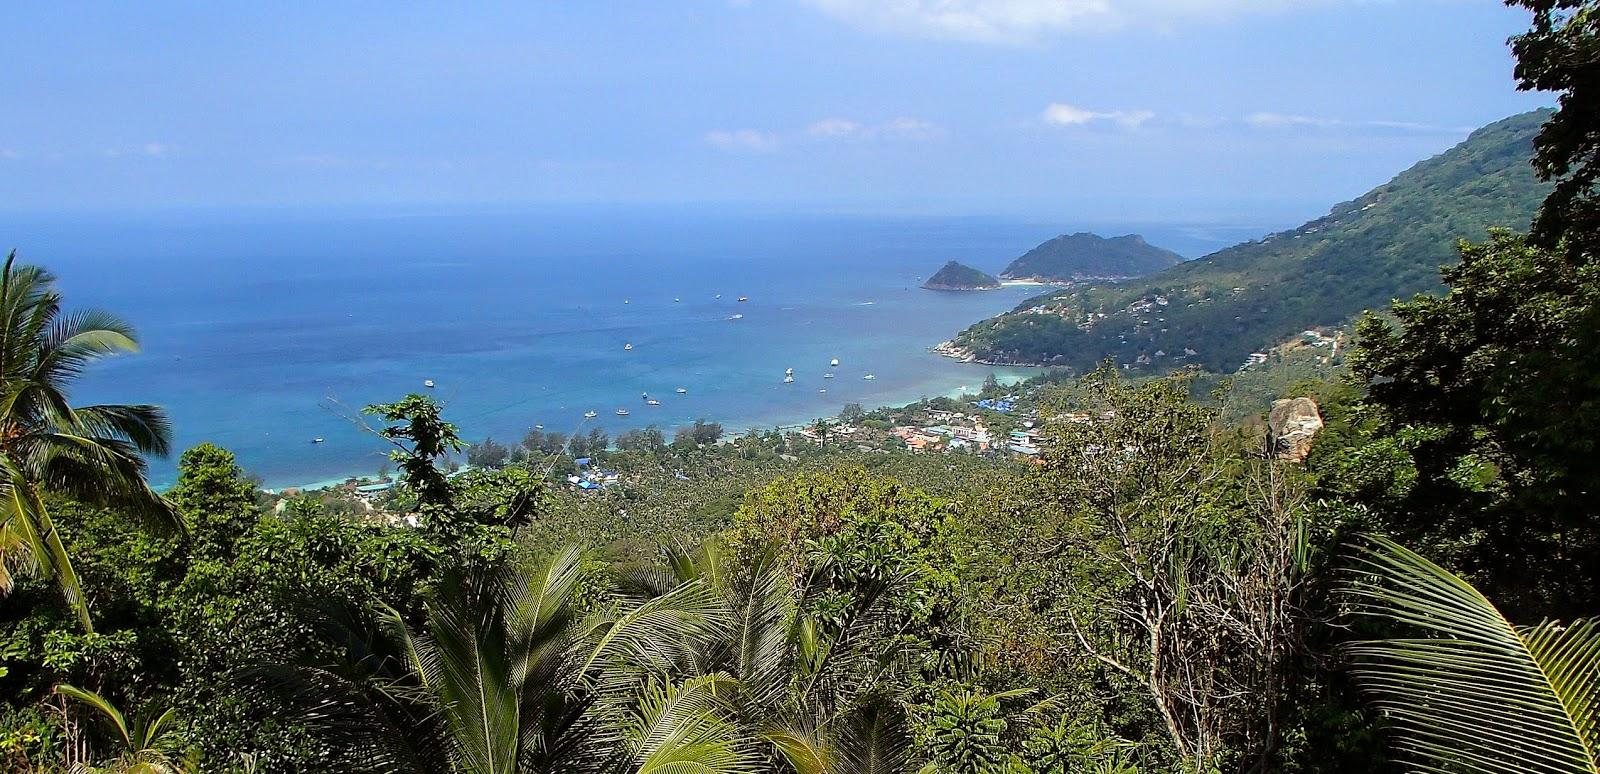 Tezzas Beaches and Islands: KO TAO UPDATED